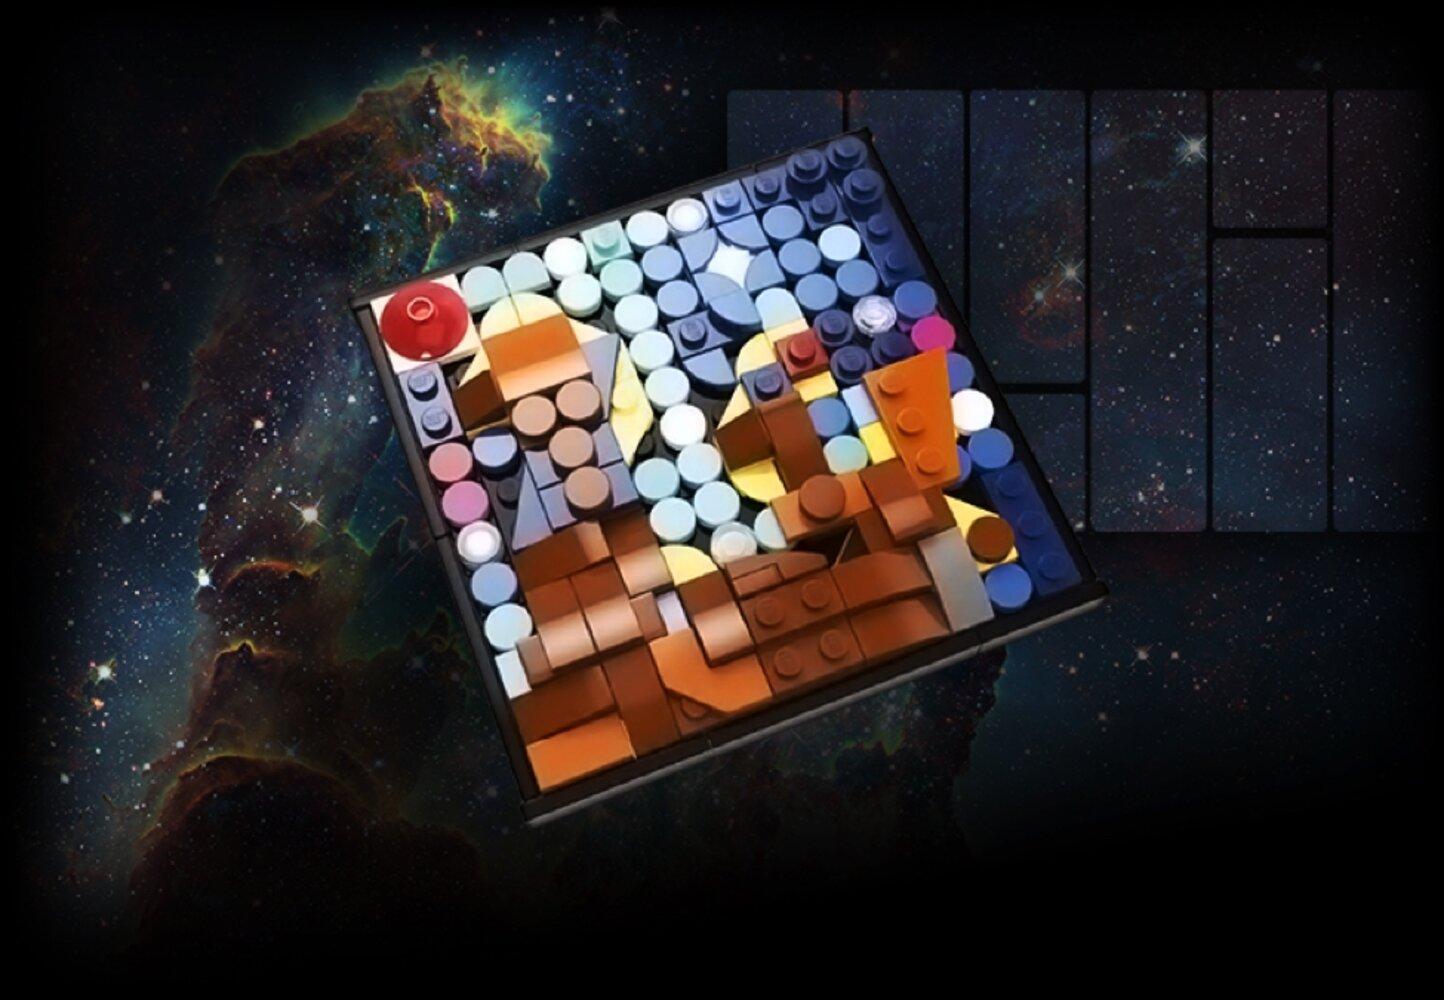 Hubble Image Mosaic